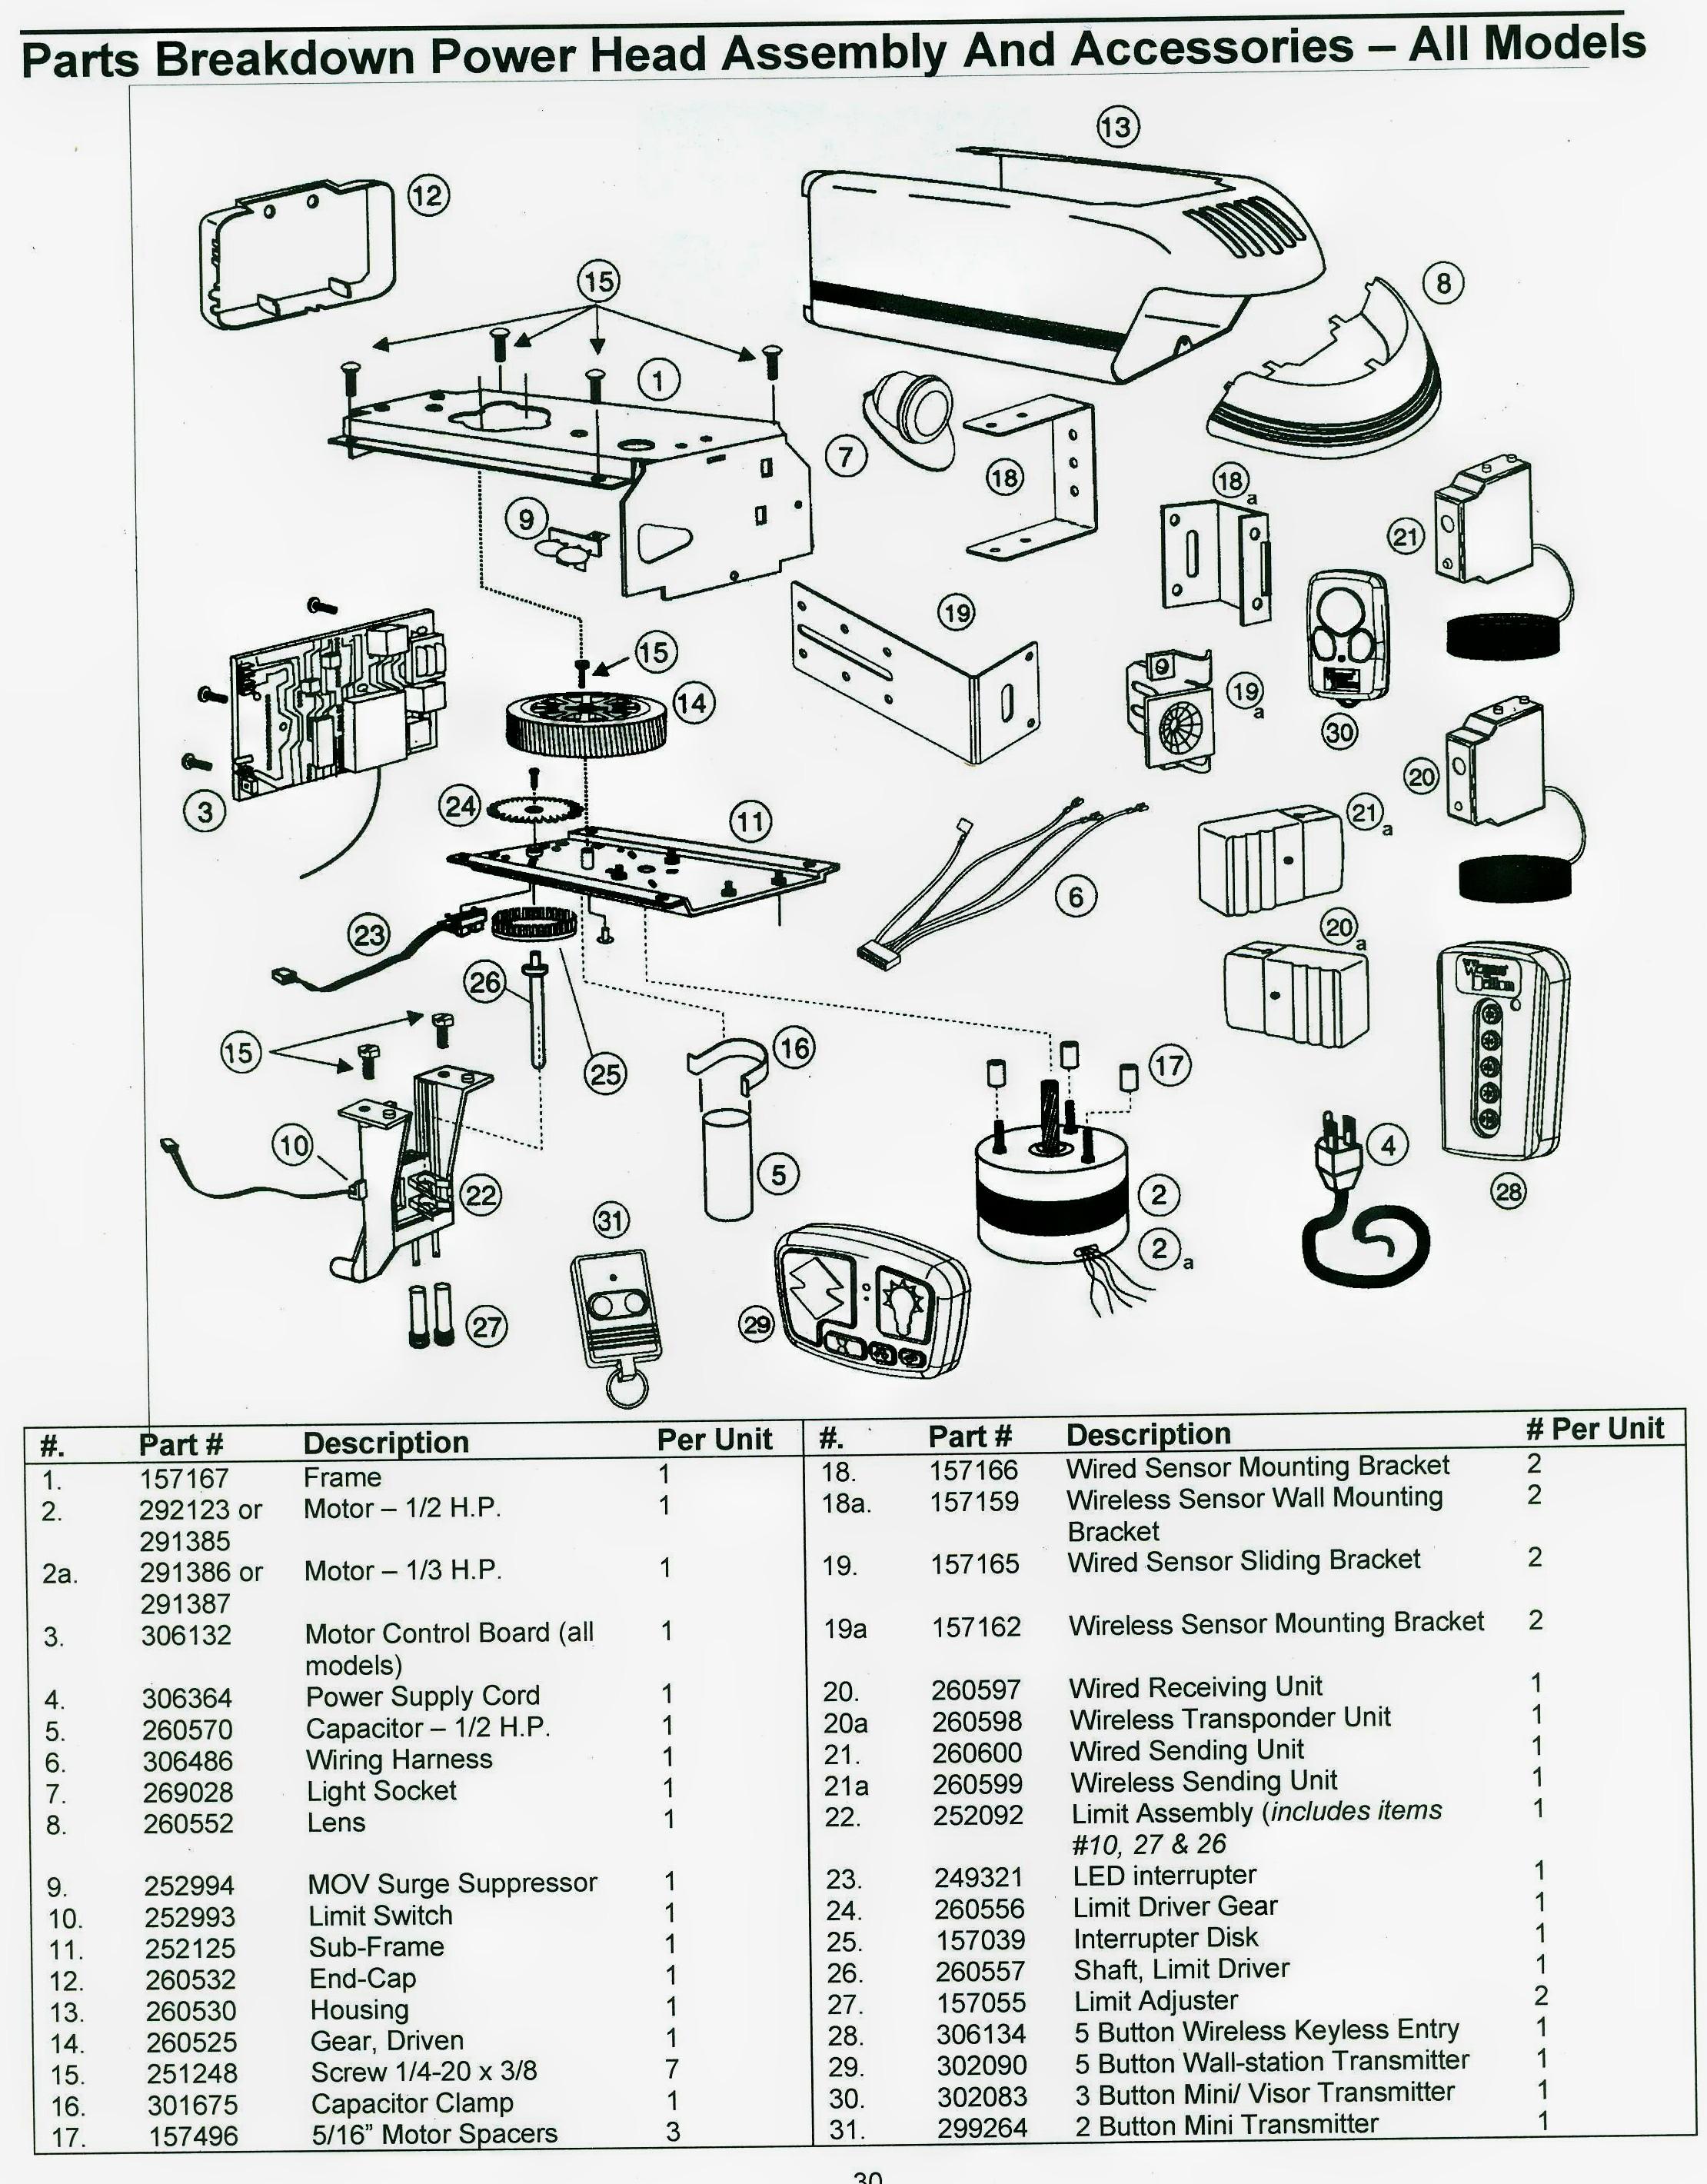 Wayne Dalton Quantum Power Head Parts Breakdown